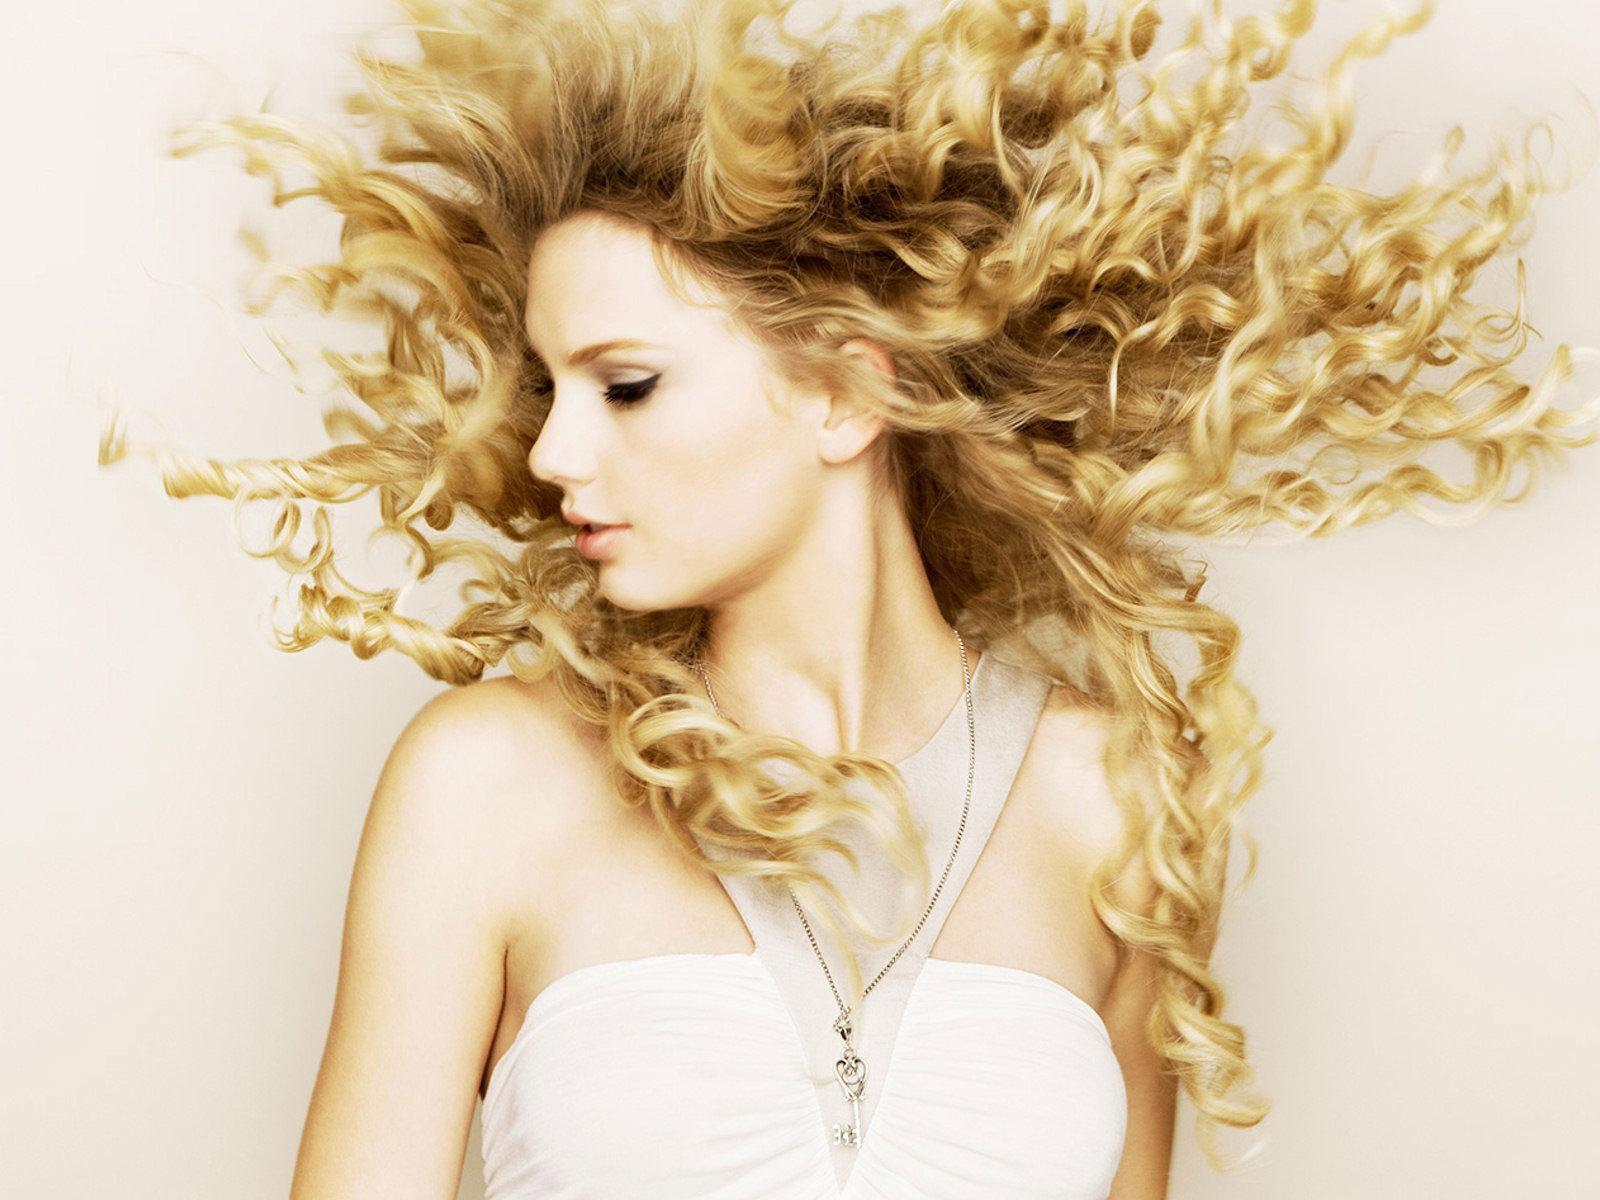 http://3.bp.blogspot.com/-9dnN81O_ea4/UK0LYtsgkXI/AAAAAAAAADE/9ynFV5p4vWQ/s1600/Fearless-fearless-taylor-swift-album-17904596-1600-1200.jpg